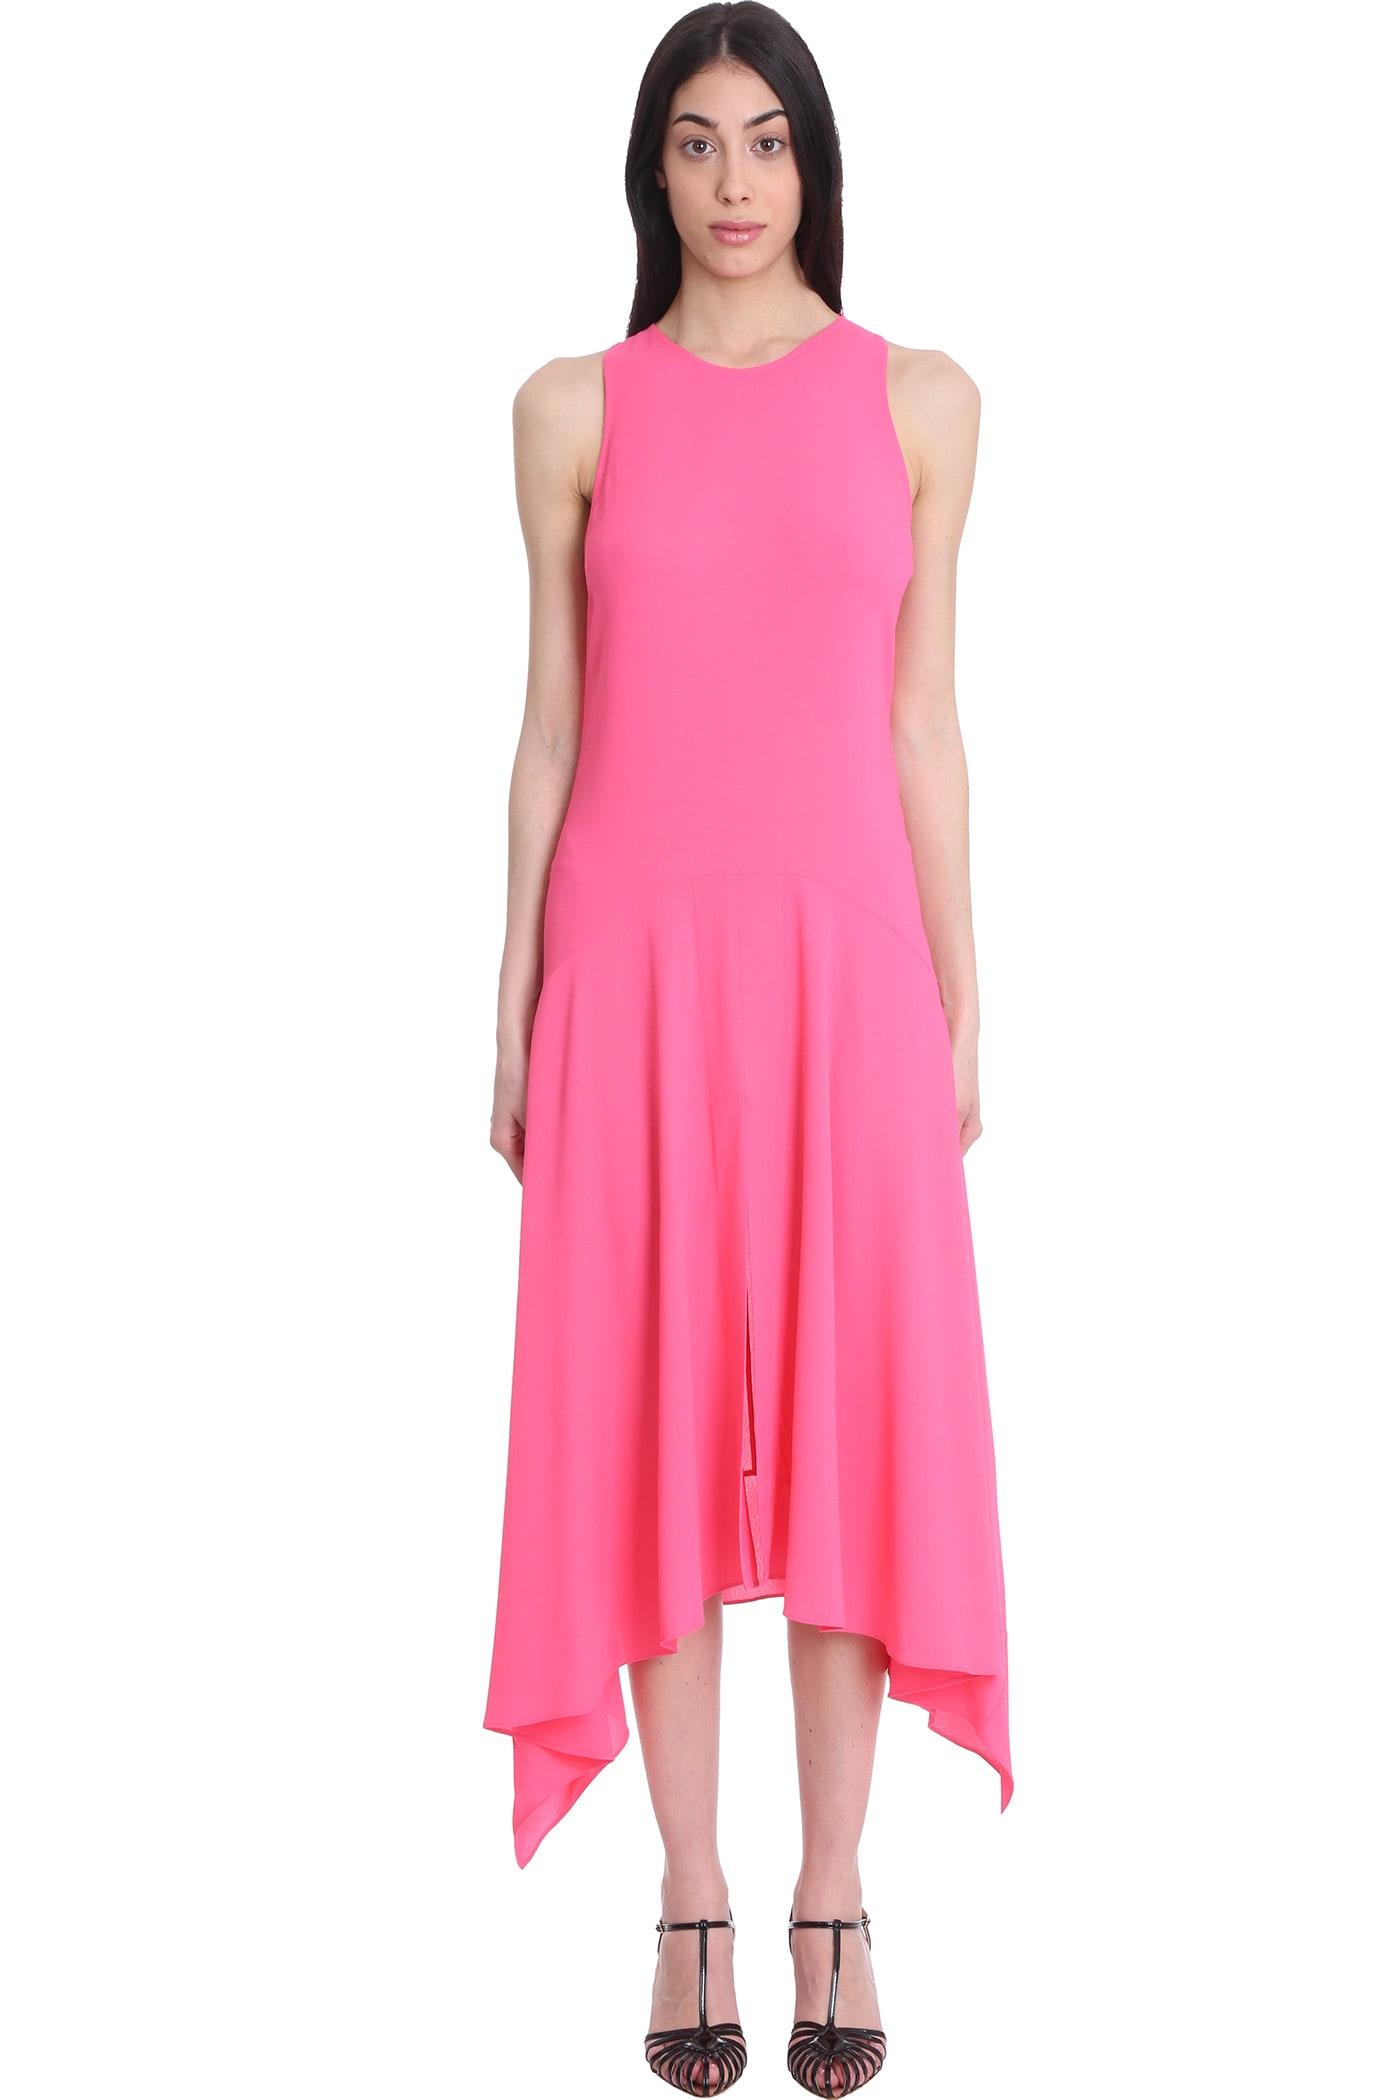 Stella McCartney Anabelle Dress In Rose-pink Viscose